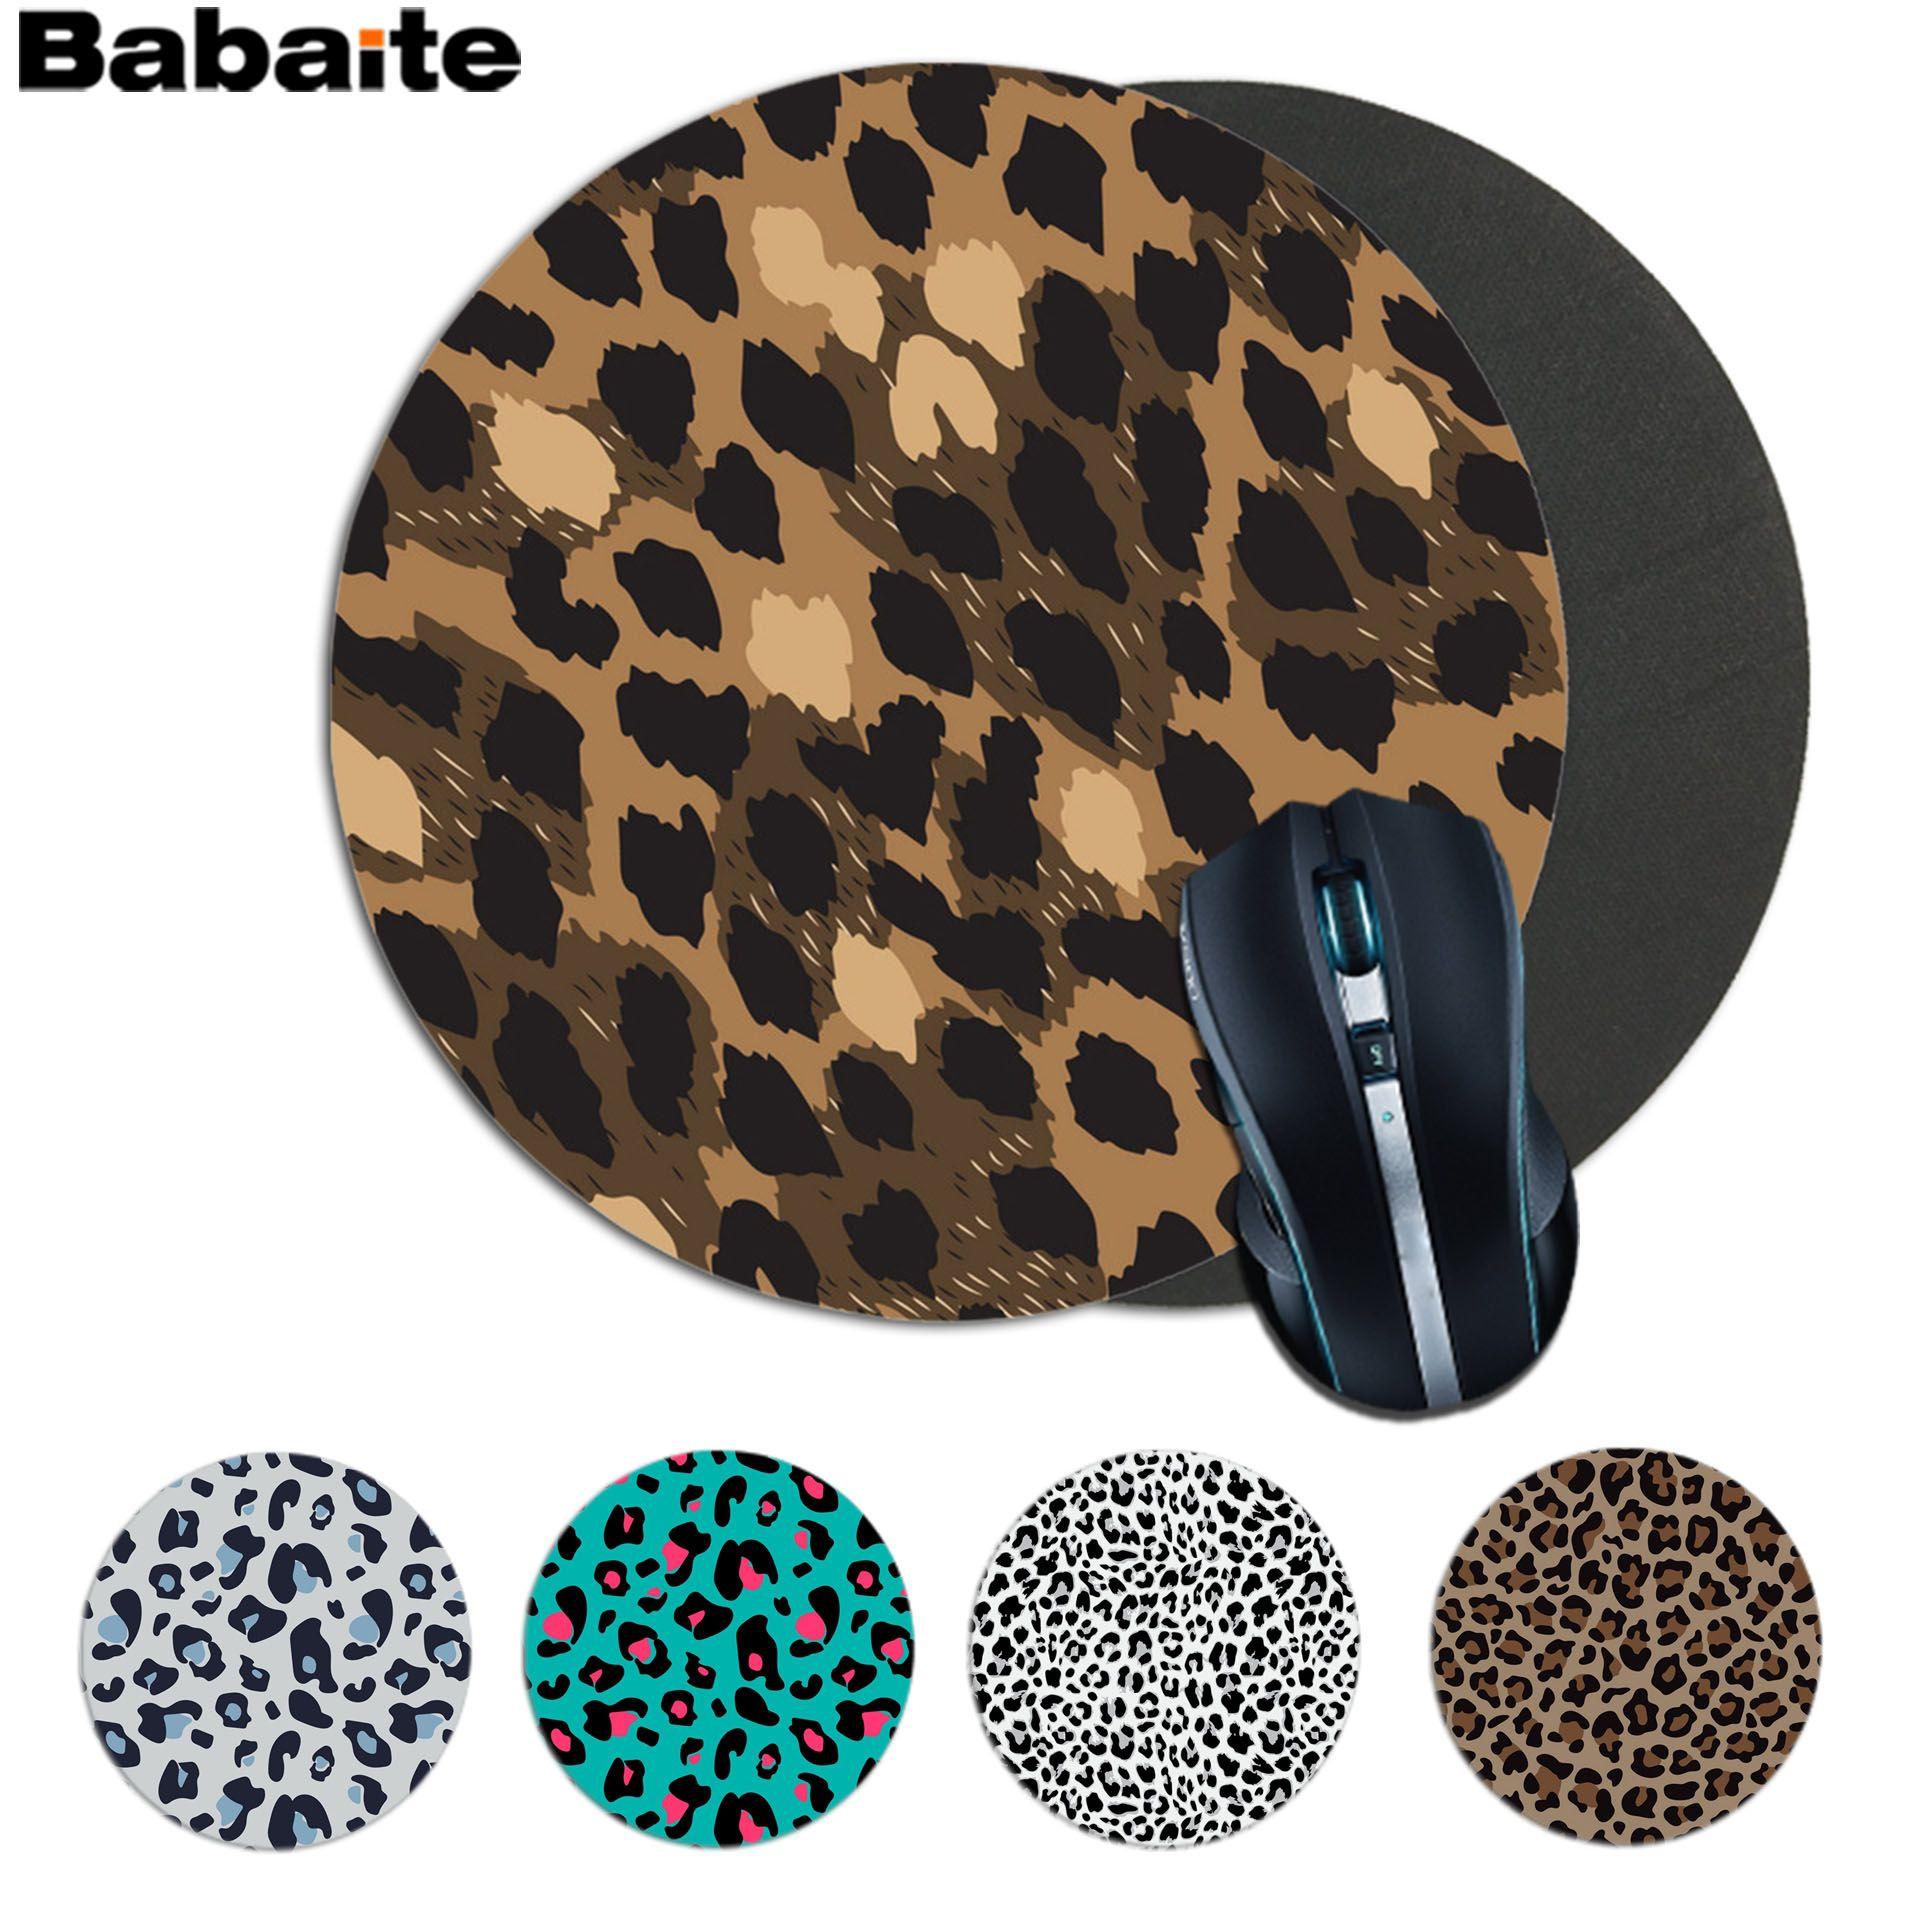 Babaite, alfombrilla ratón de leopardo de nuevo diseño, alfombrilla ratón para juegos de alfombrillas de ratón gaming para ordenador portátil